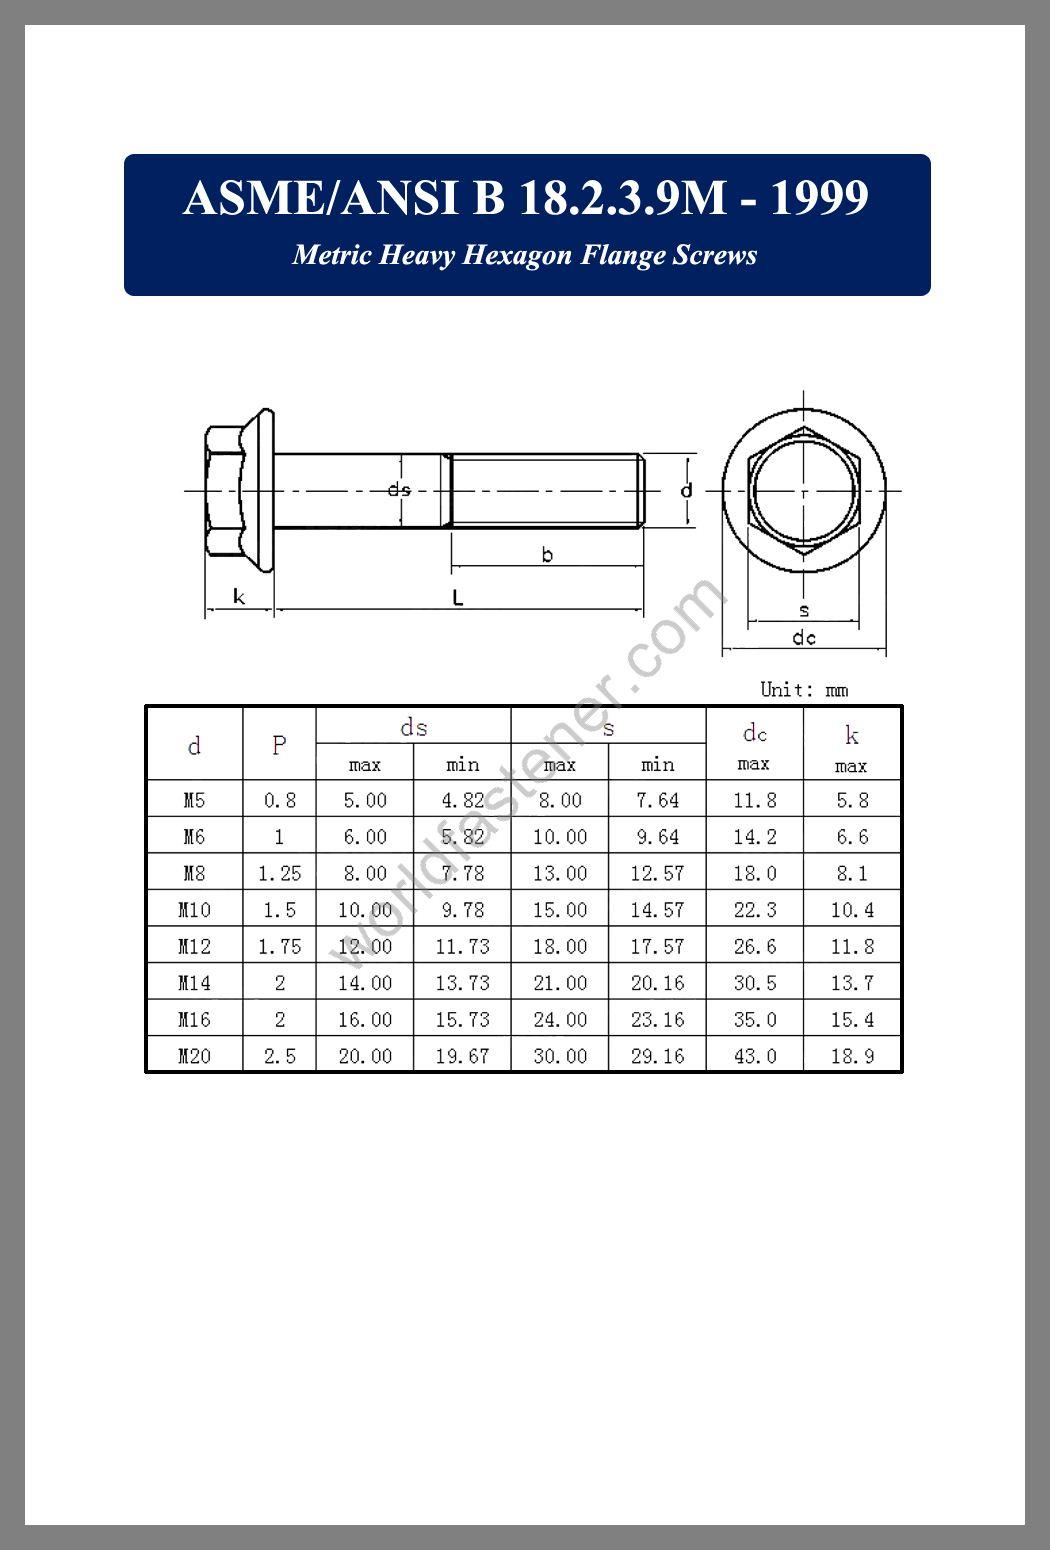 ASME-ANSI B 18.2.3.9M, Metric Heavy Hexagon Flange Screws, Flanged Bolts, Flange screws, fastener, screw, bolt, ASME bolts, ANSI screws